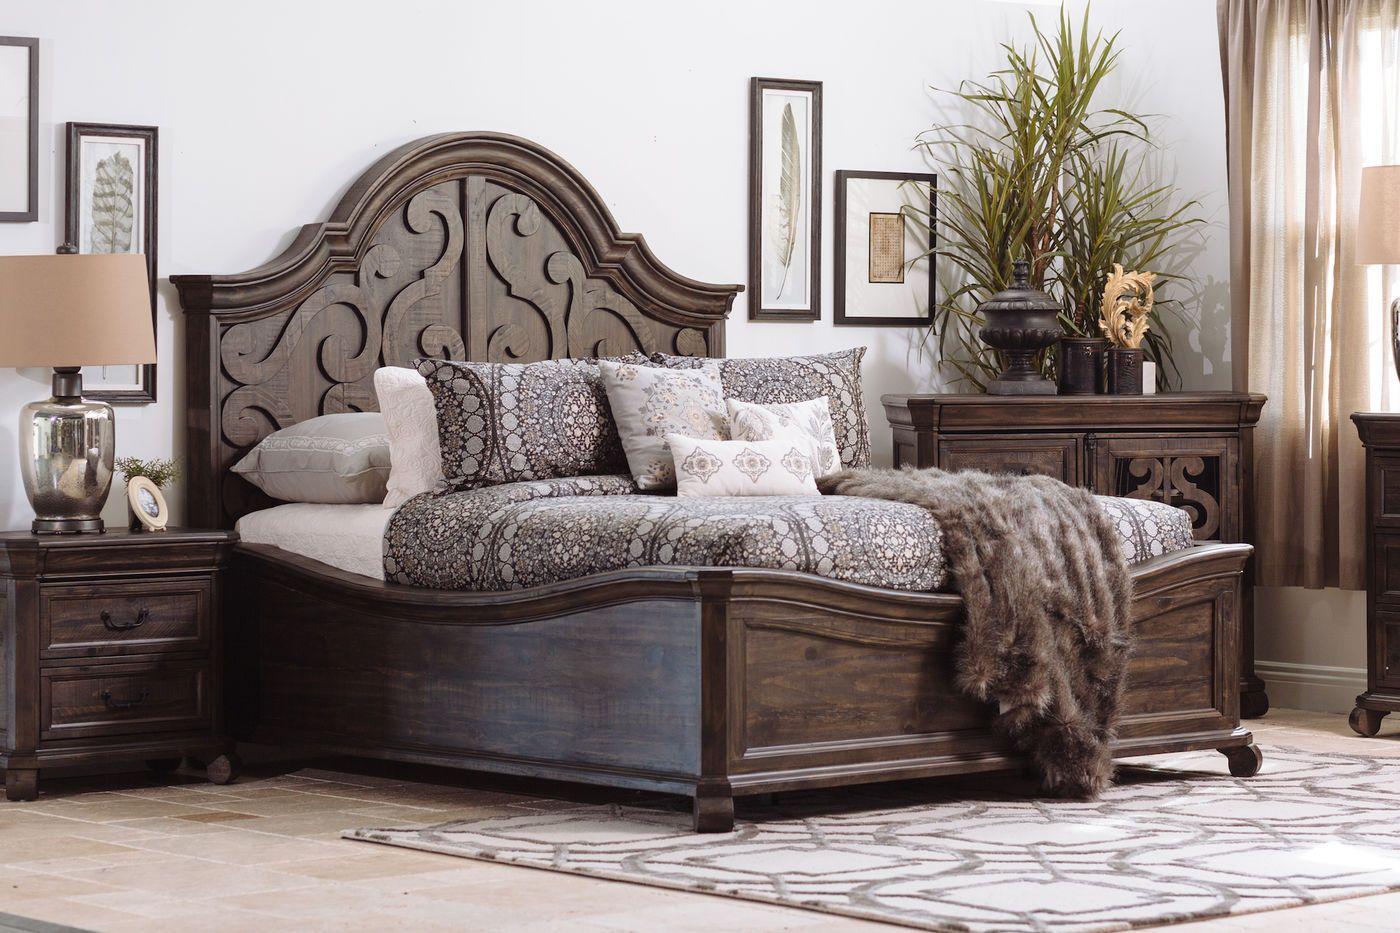 Magnussen Home Bellamy Peppercorn King Shaped Panel Bed Panel Bed Bedroom Furniture Beds Bed Furniture